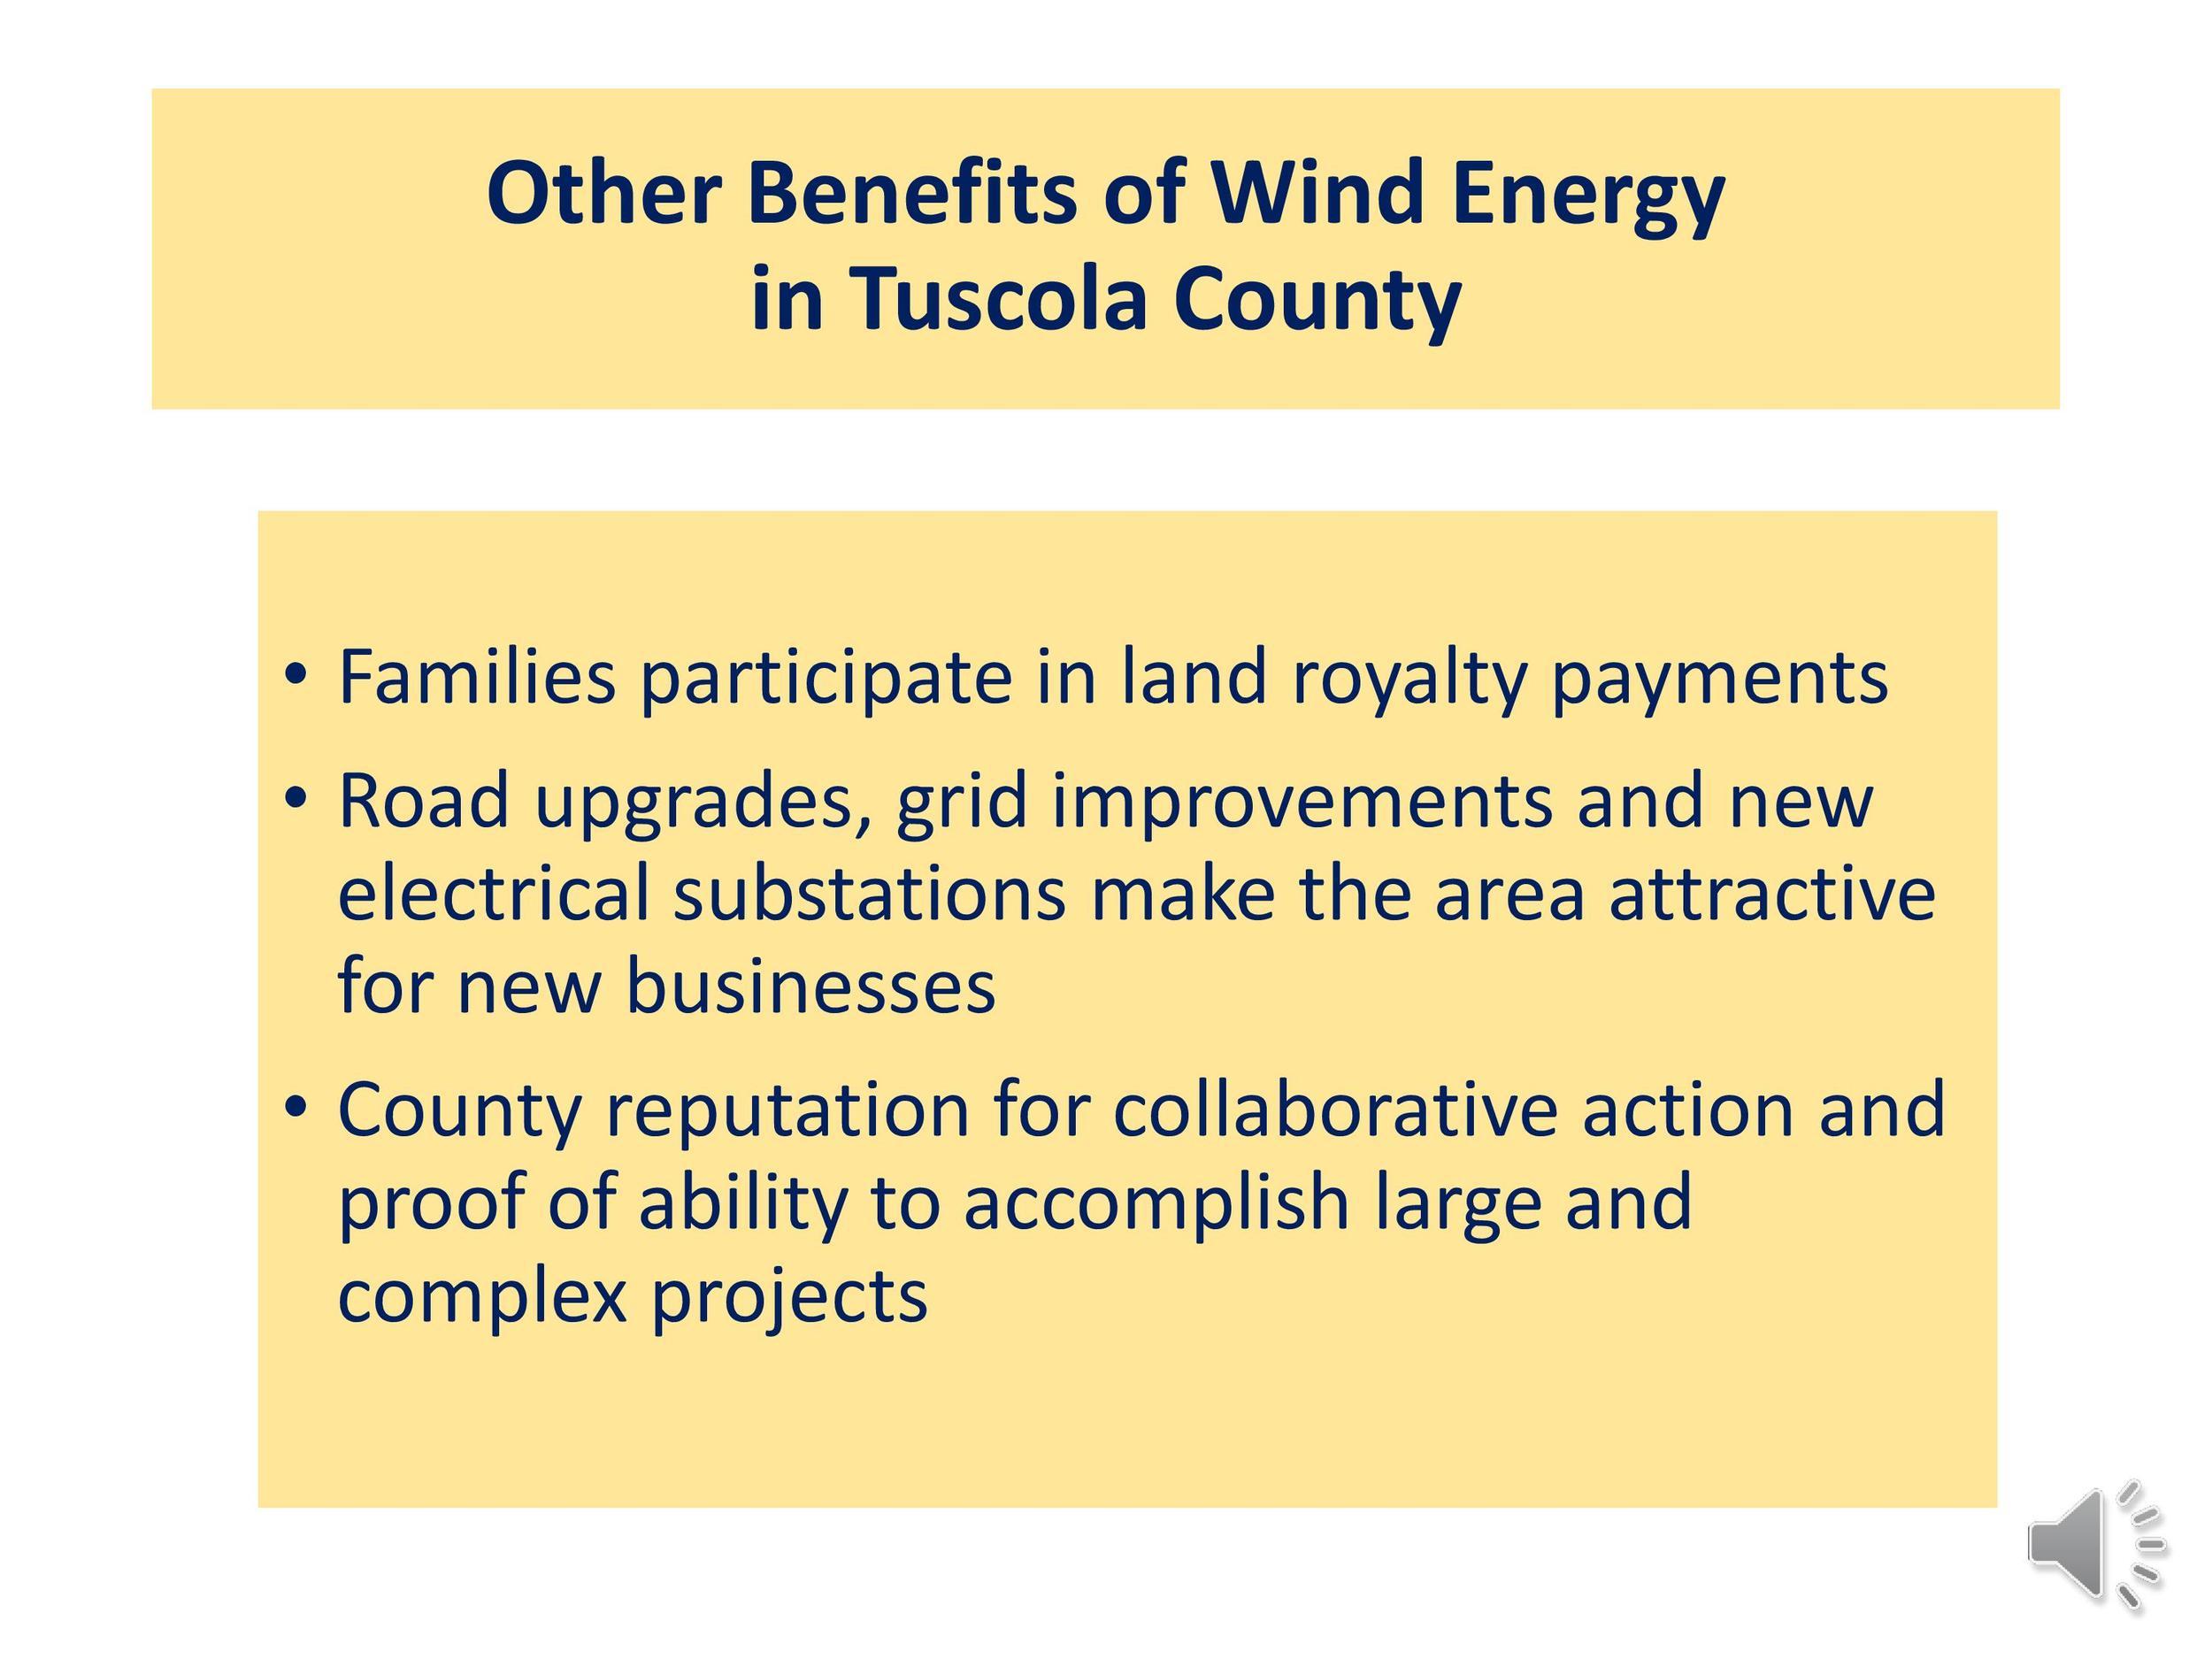 Wind Energy in Tuscola-page-015.jpg